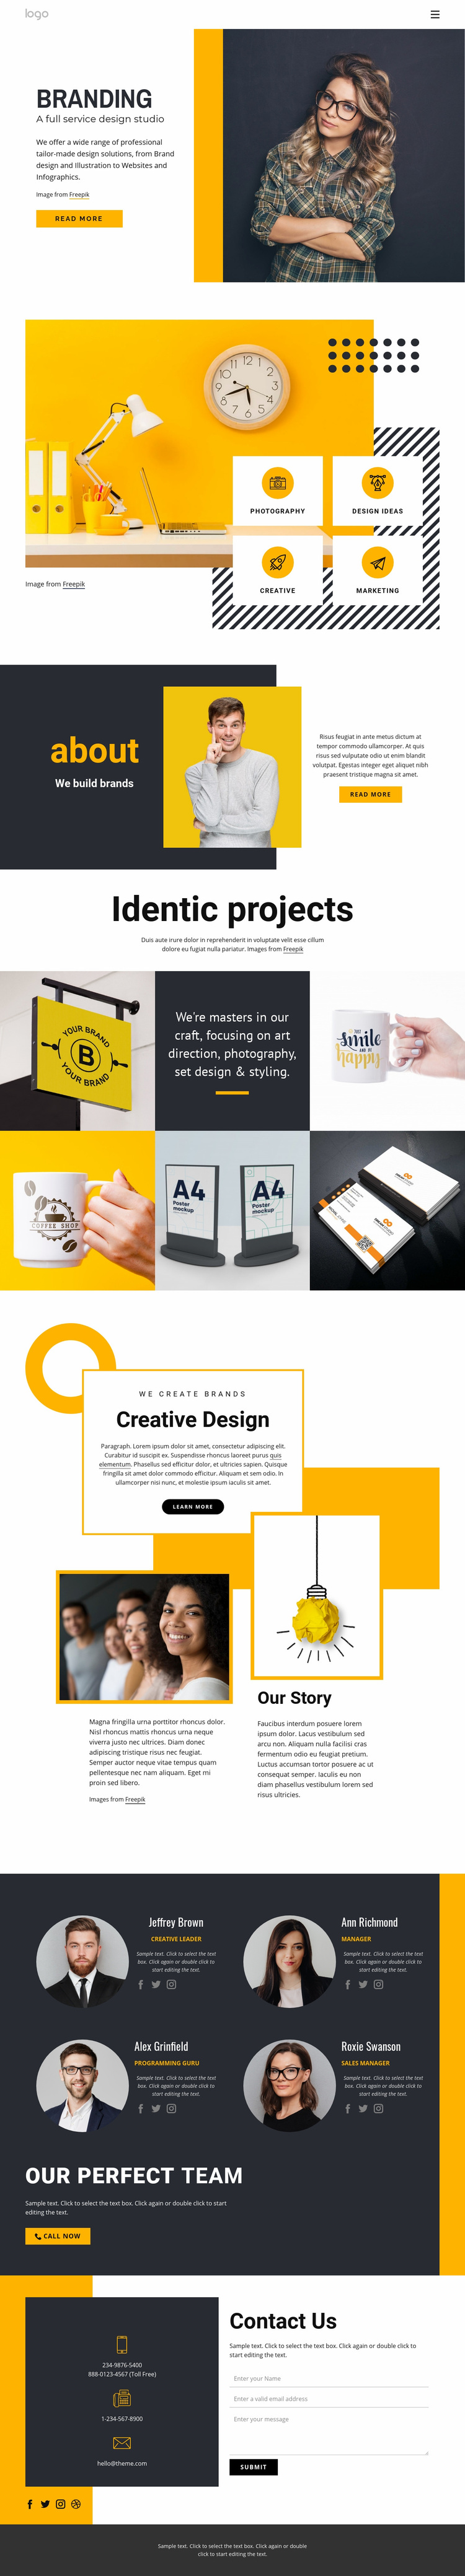 Full-service design studio Web Page Designer